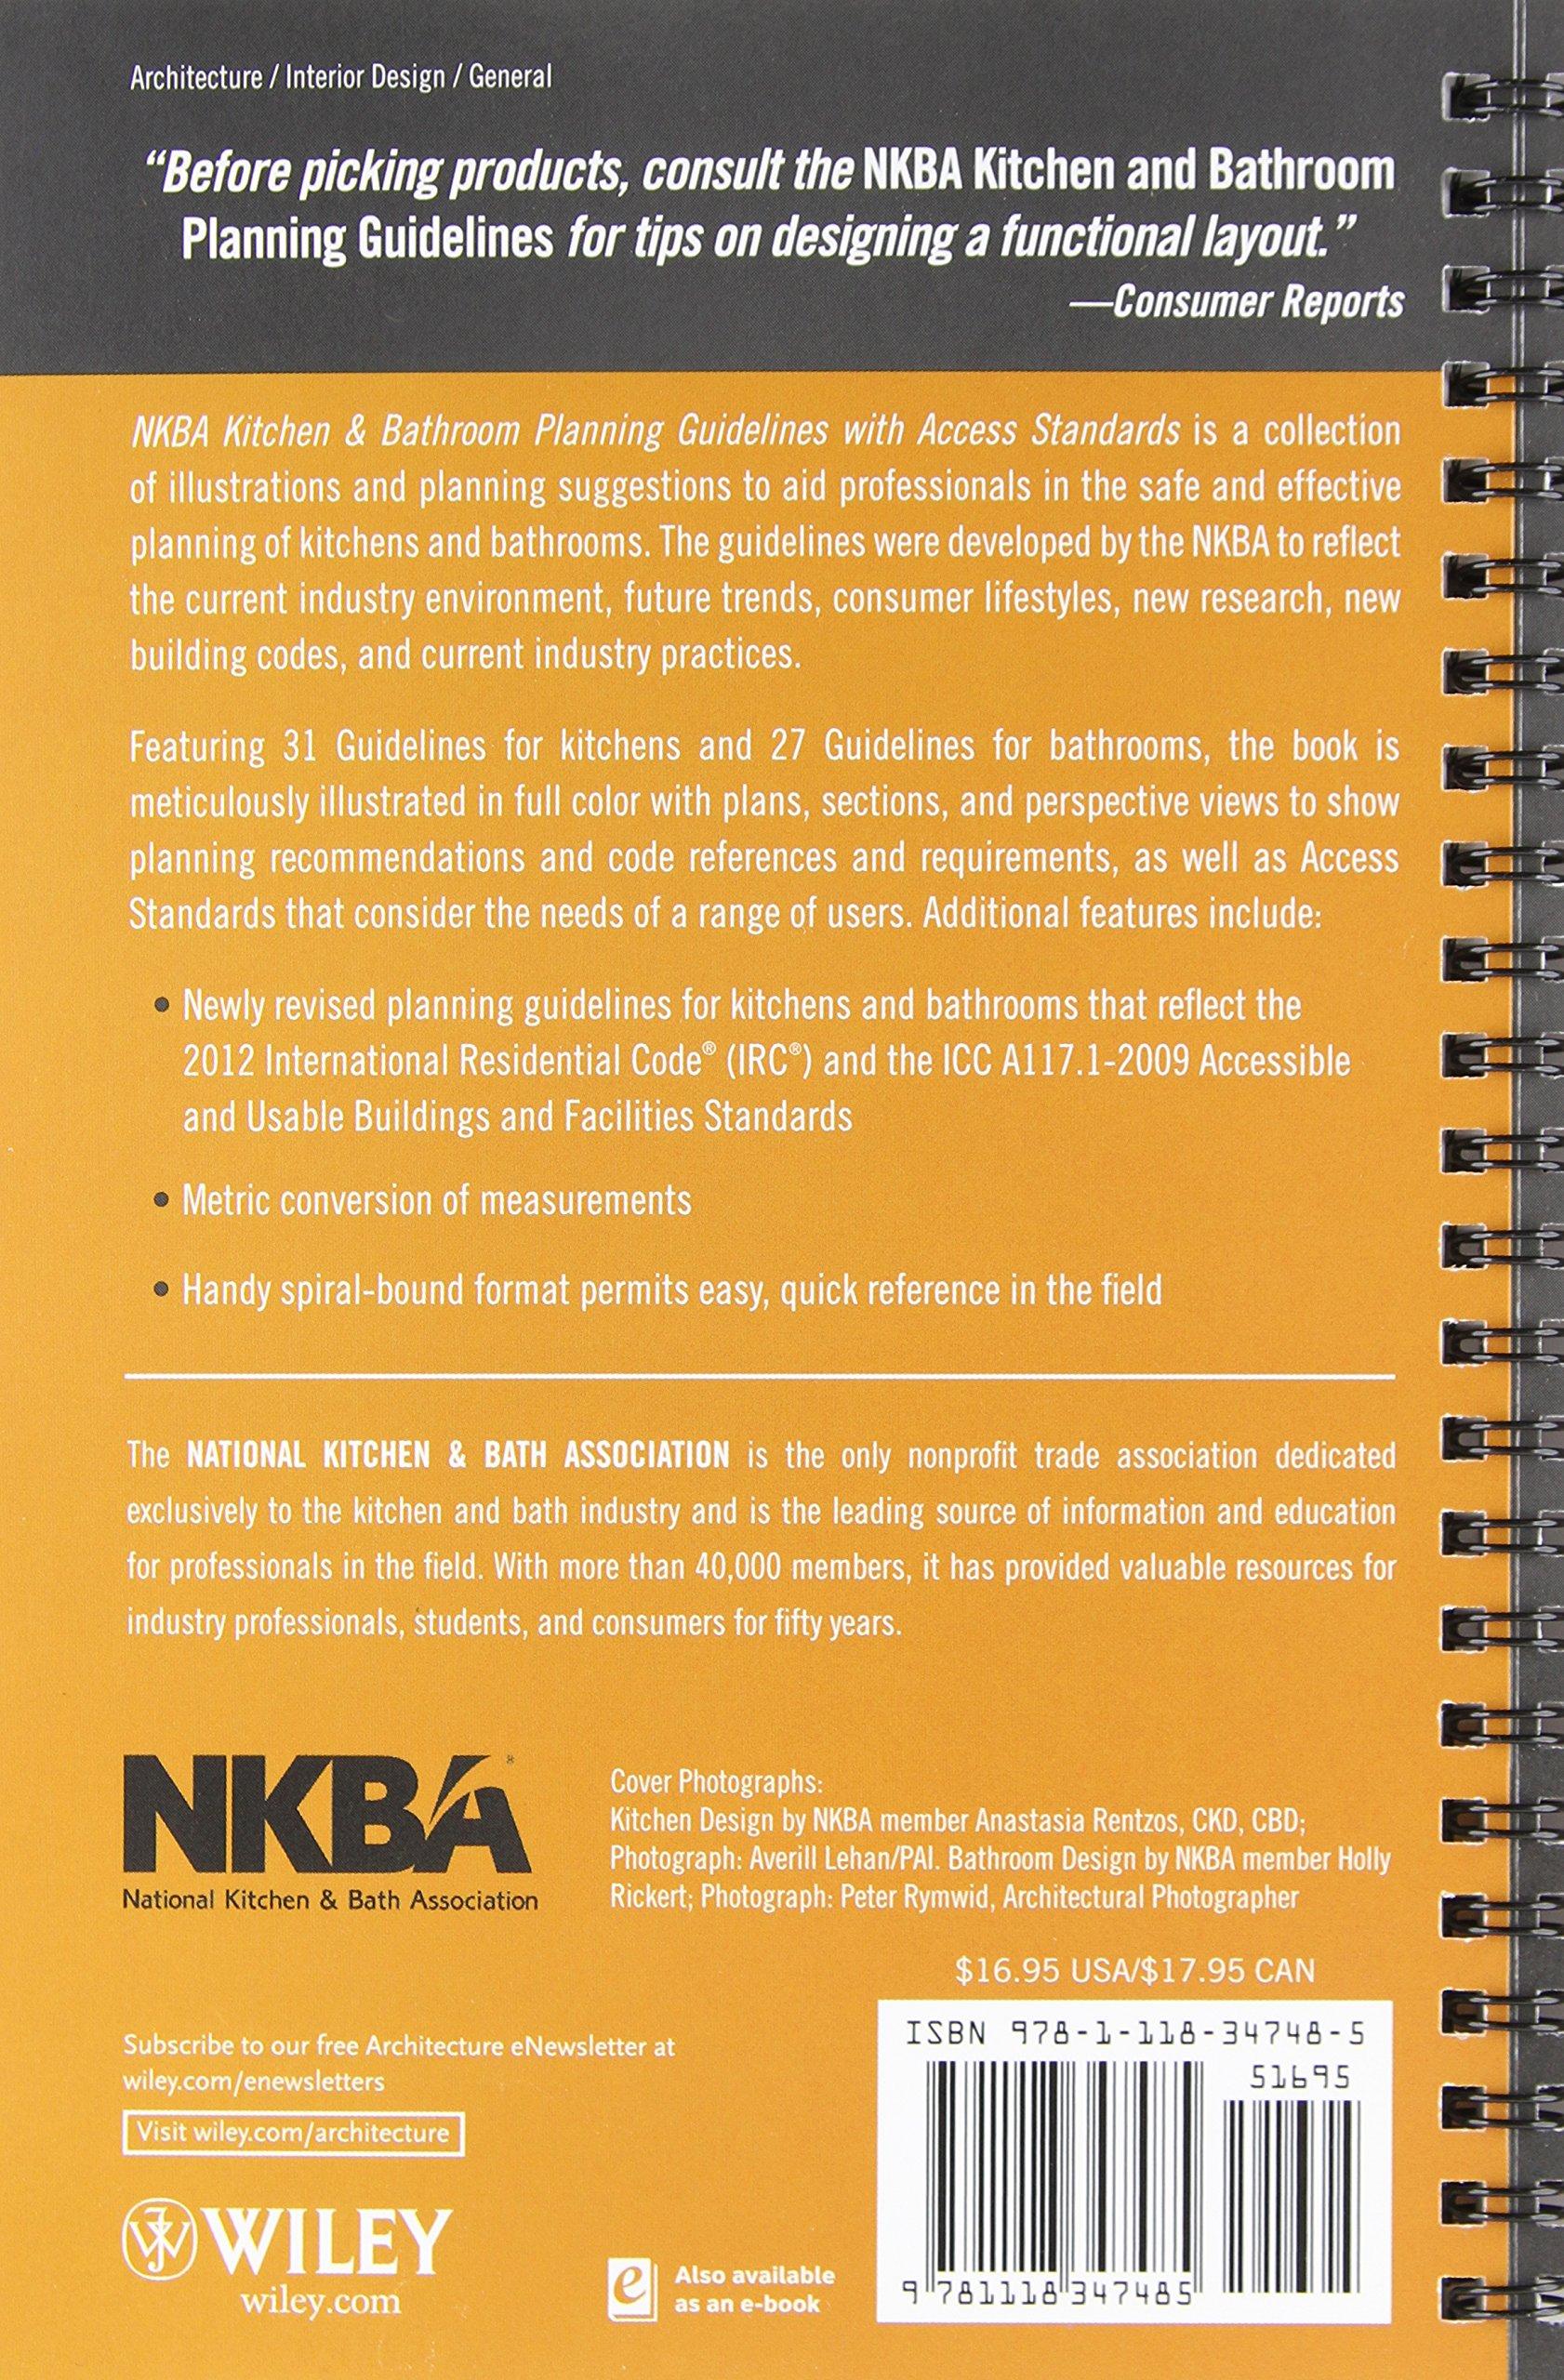 National kitchen and bath association guidelines - Nkba Kitchen And Bathroom Planning Guidelines With Access Standards Nkba National Kitchen And Bath Association 9781118347485 Books Amazon Ca